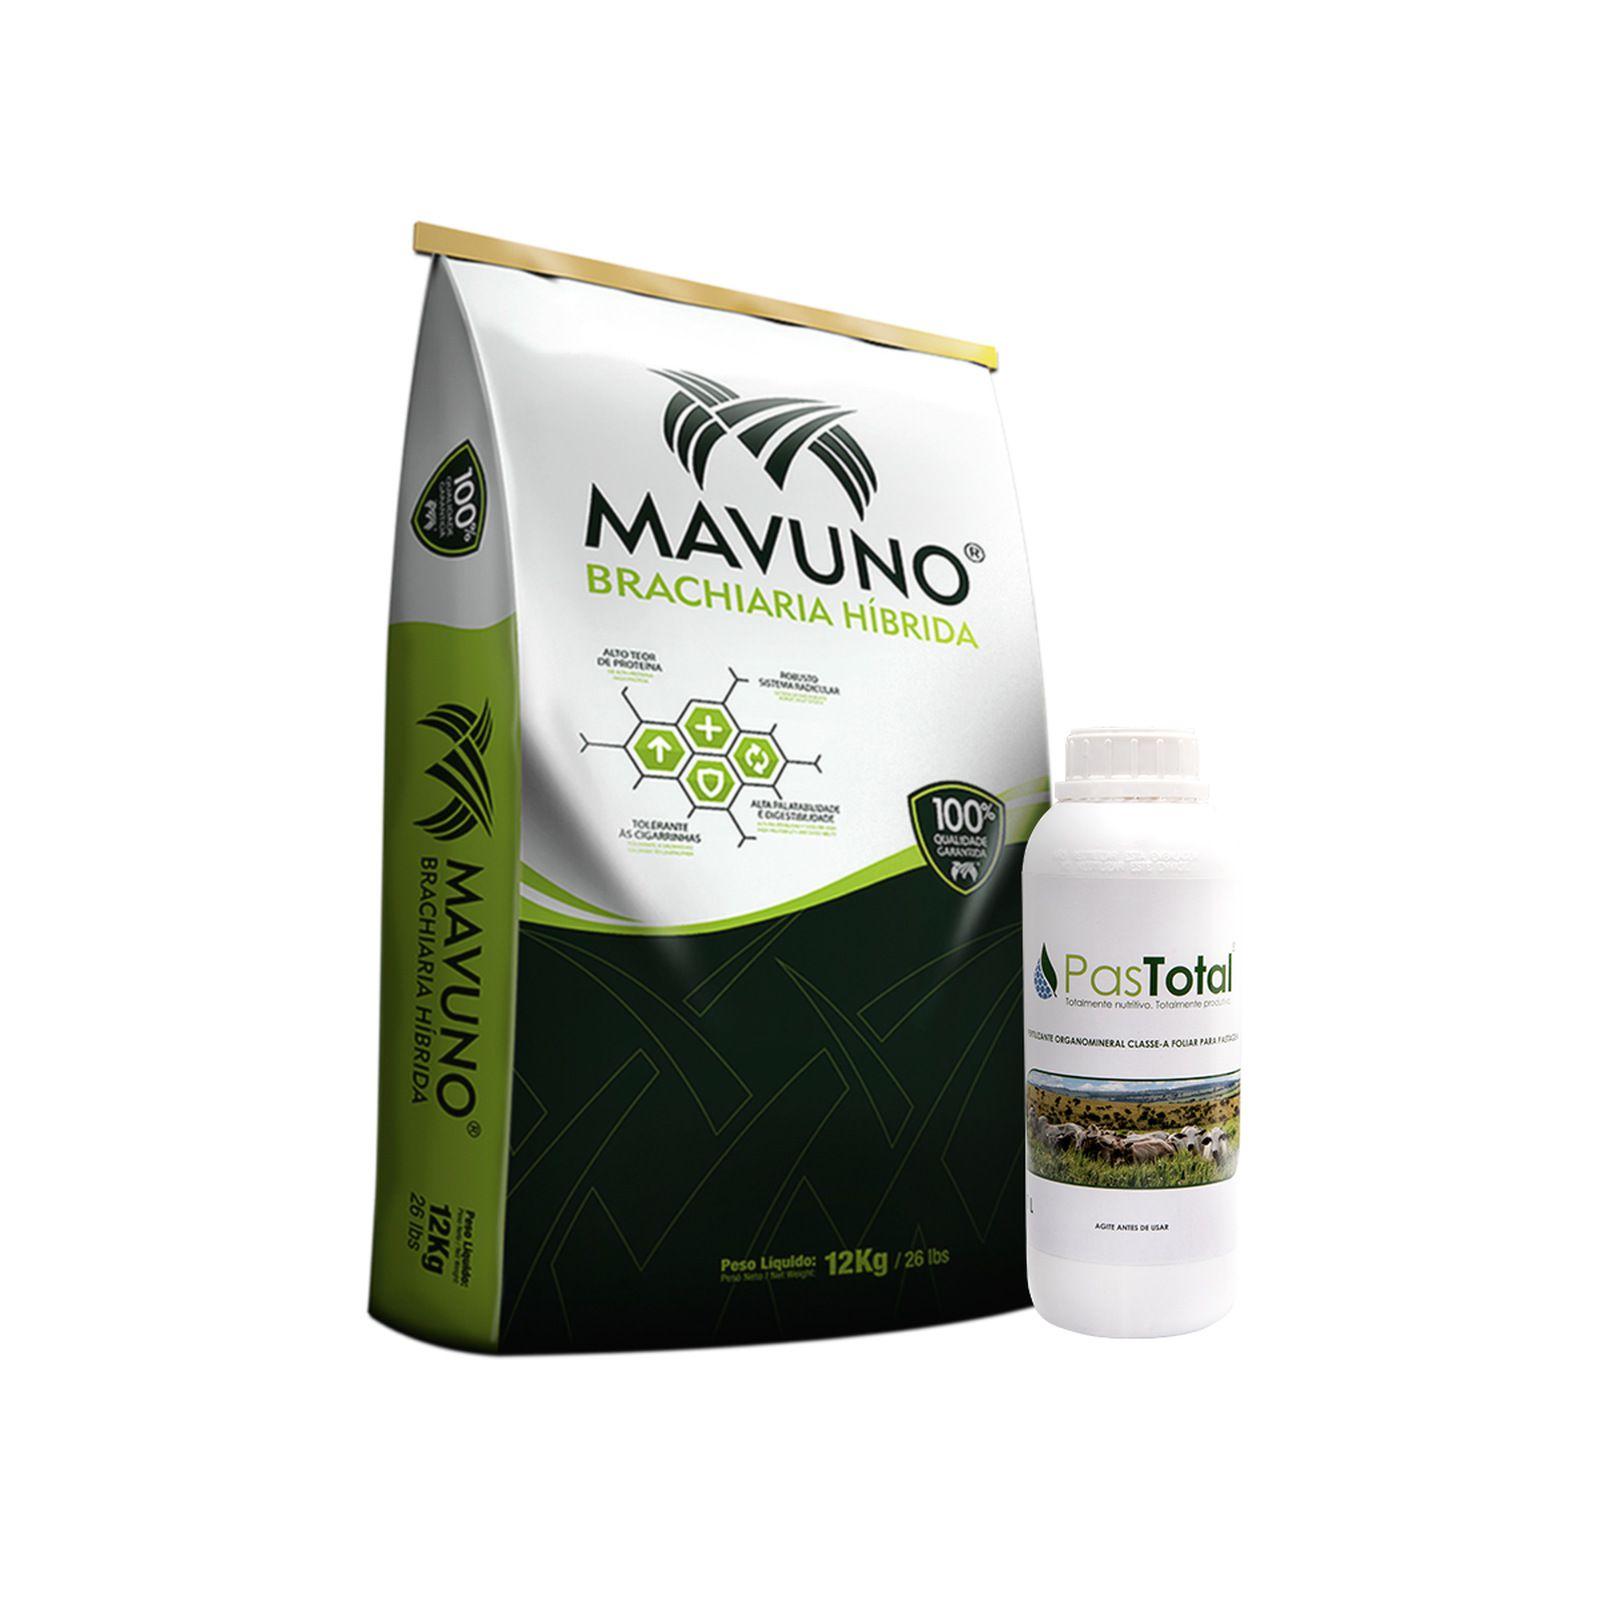 Sementes para capim Brachiaria Híbrida Mavuno 12kg + Pastotal 1 Litro